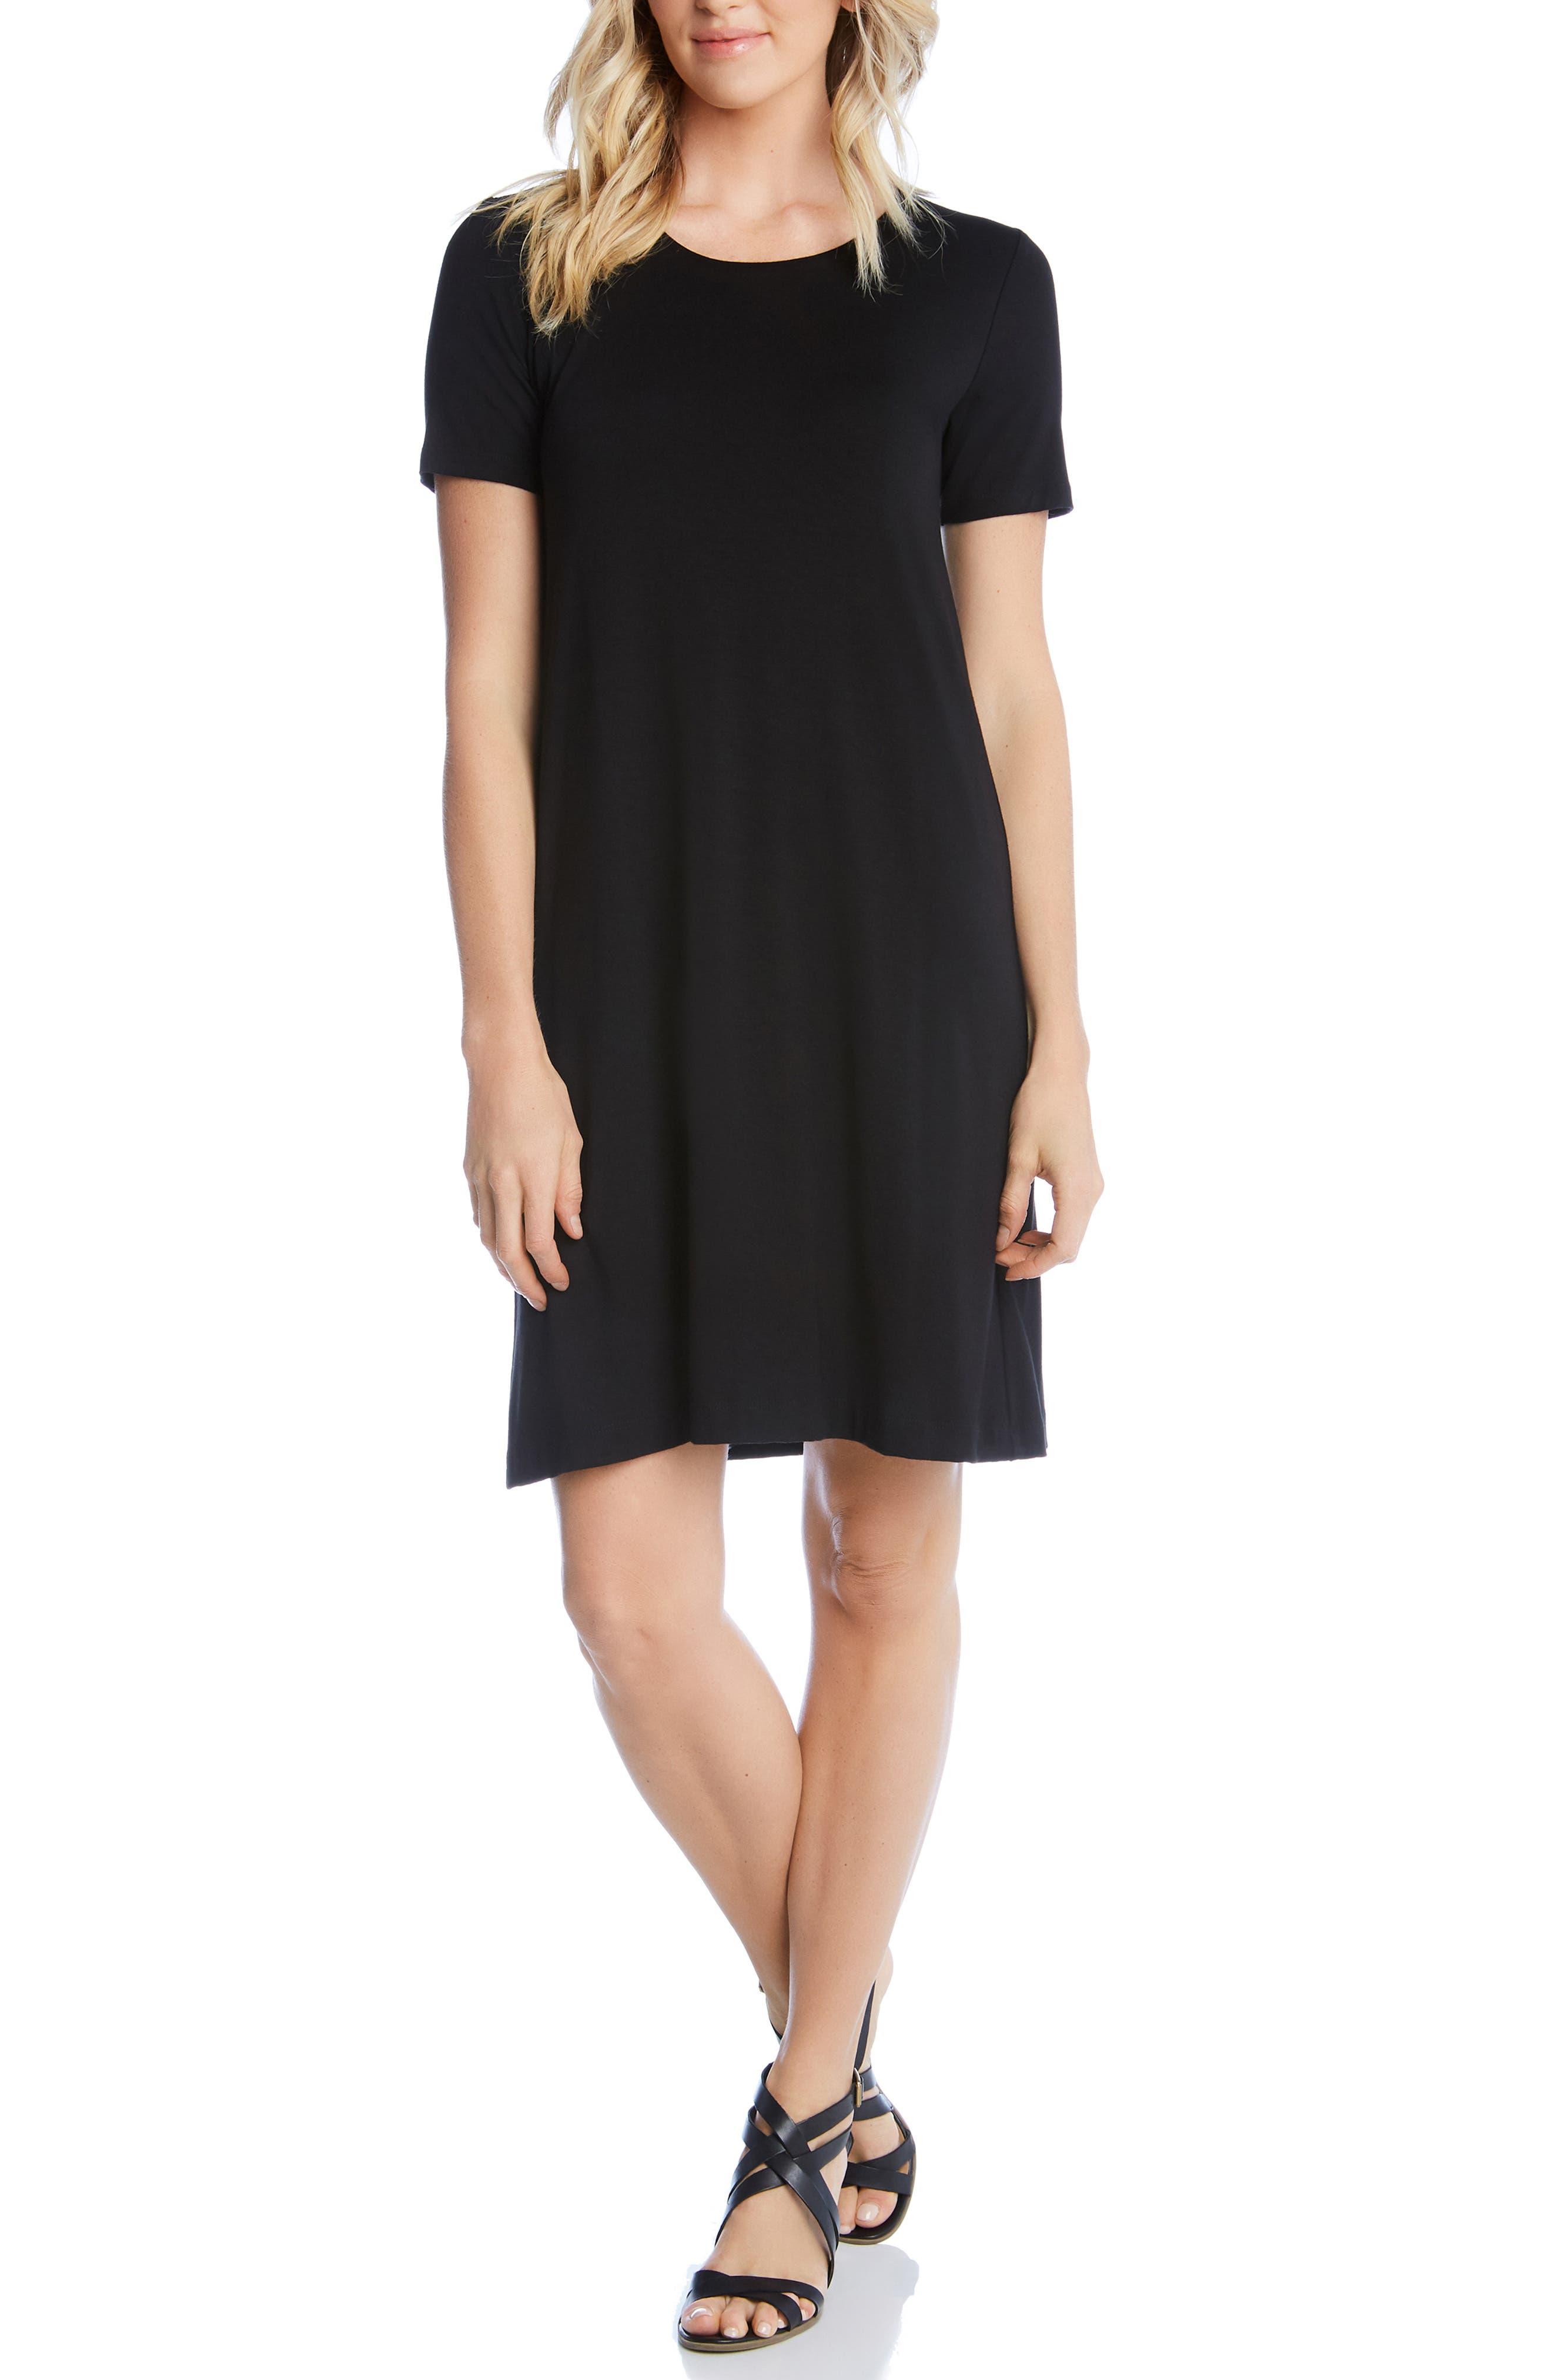 KAREN KANE Abby T-Shirt Dress, Main, color, BLACK